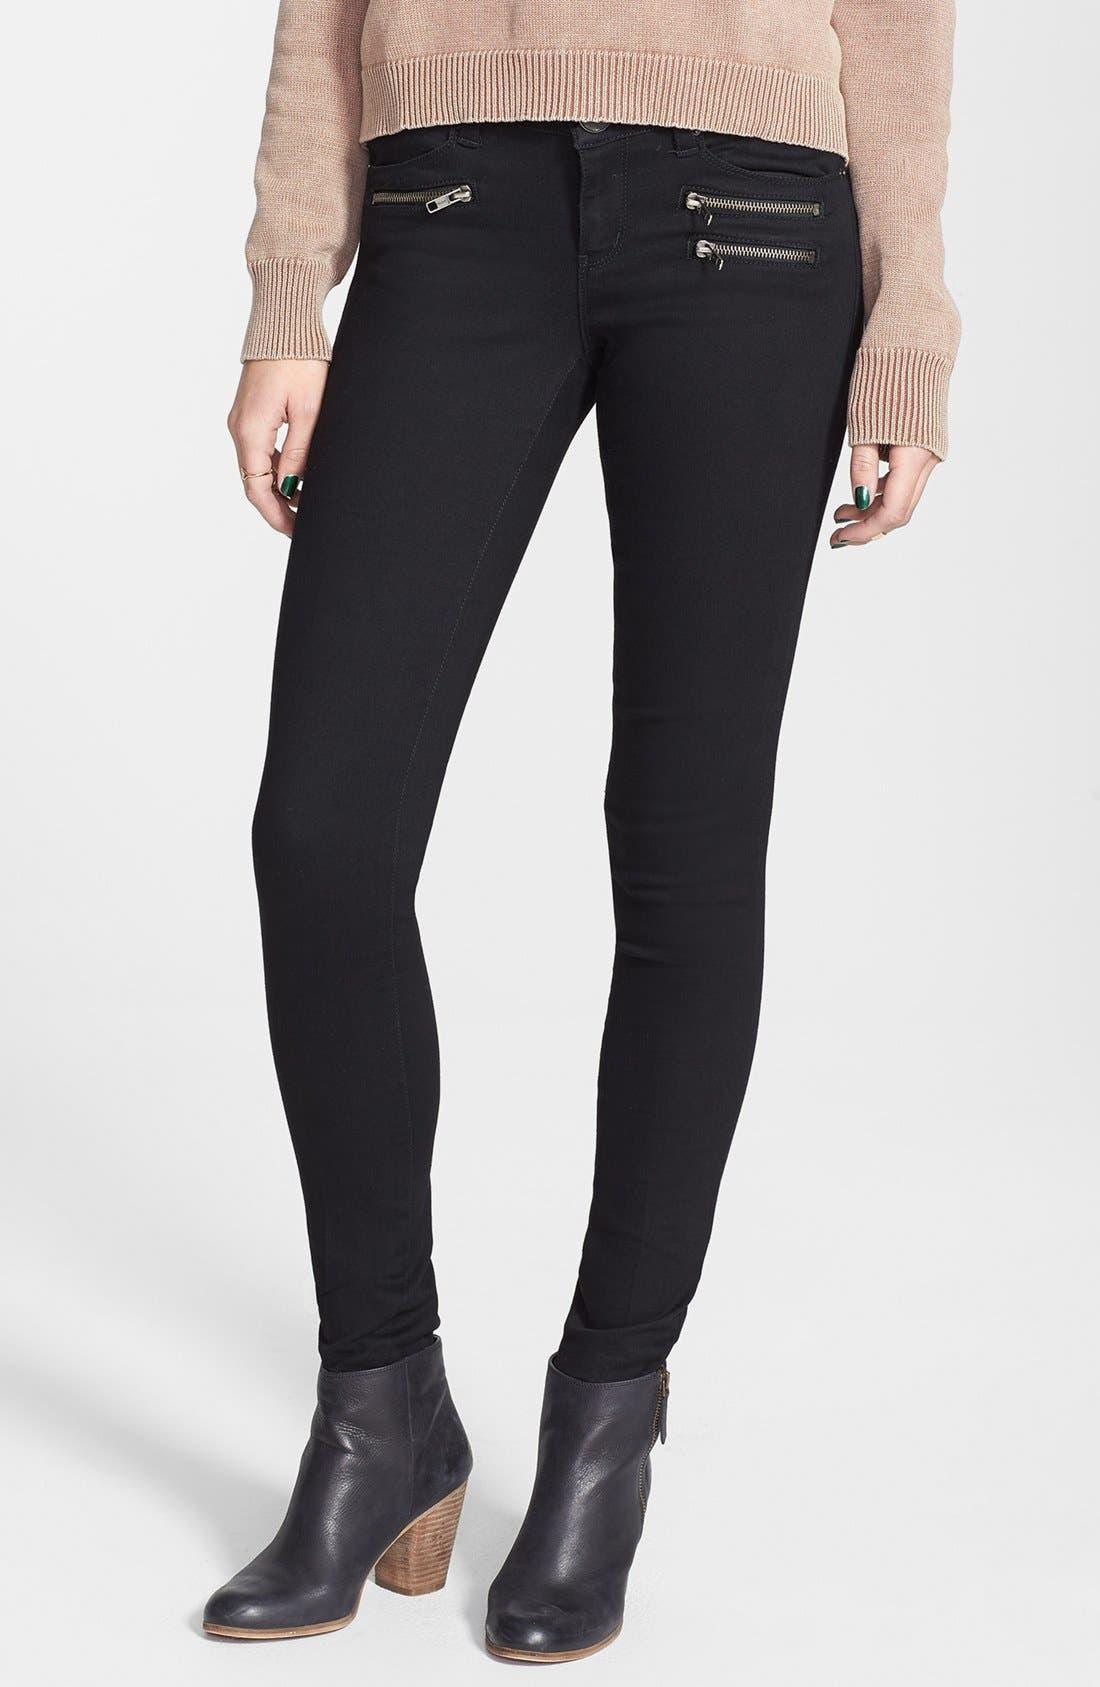 Alternate Image 1 Selected - Jolt Zipper Skinny Jeans (Juniors)